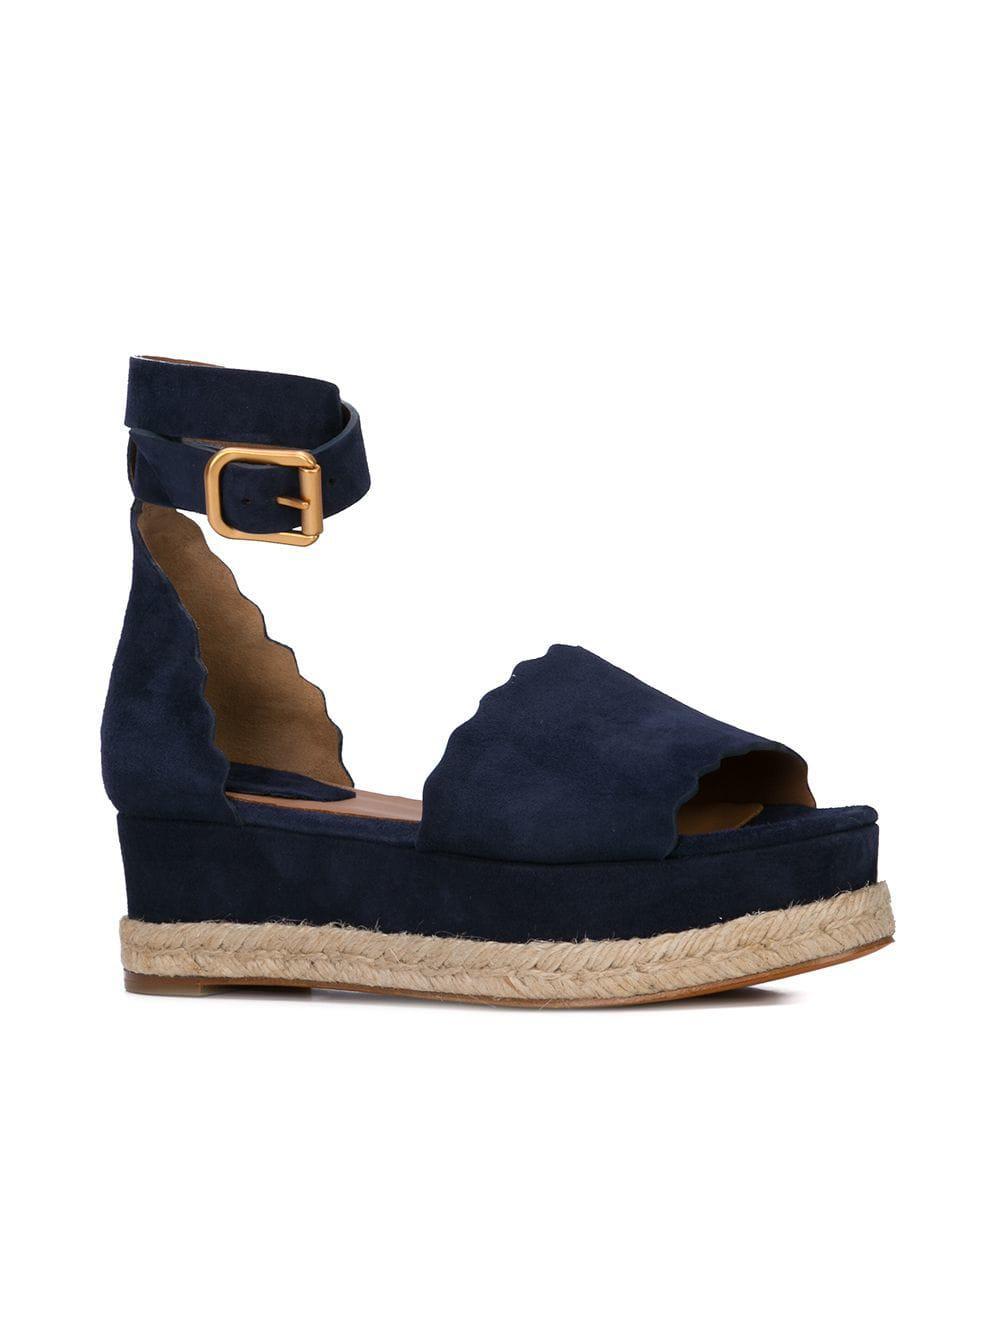 ea936a6824b0 Lyst - Chloé Espadrille Platform Sandals in Blue